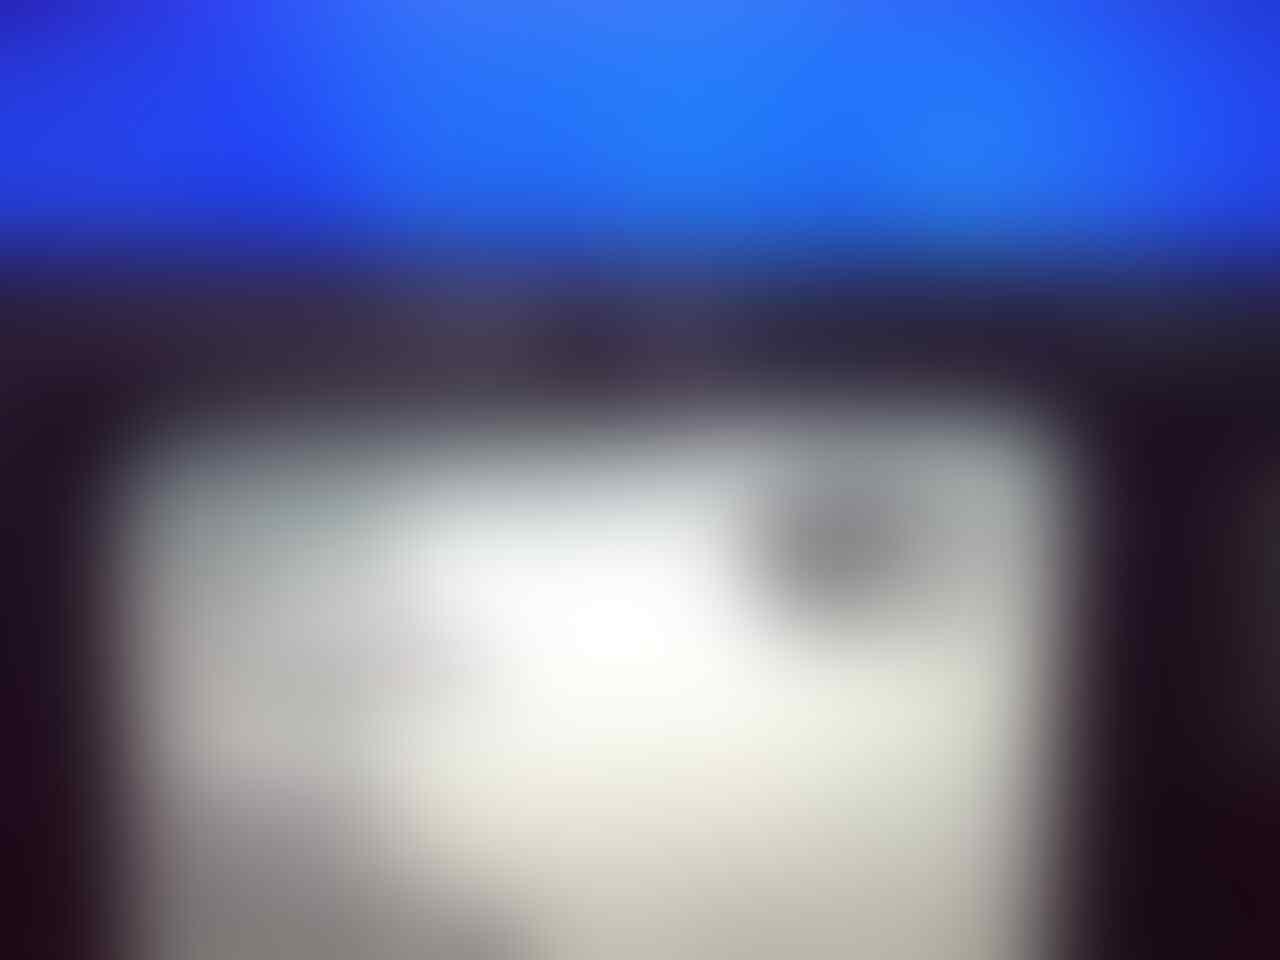 REVIEW DAN DISKUSI MODEM WIFI MIFI HUAWEI E5577 BOLT MAX 150 MBPS